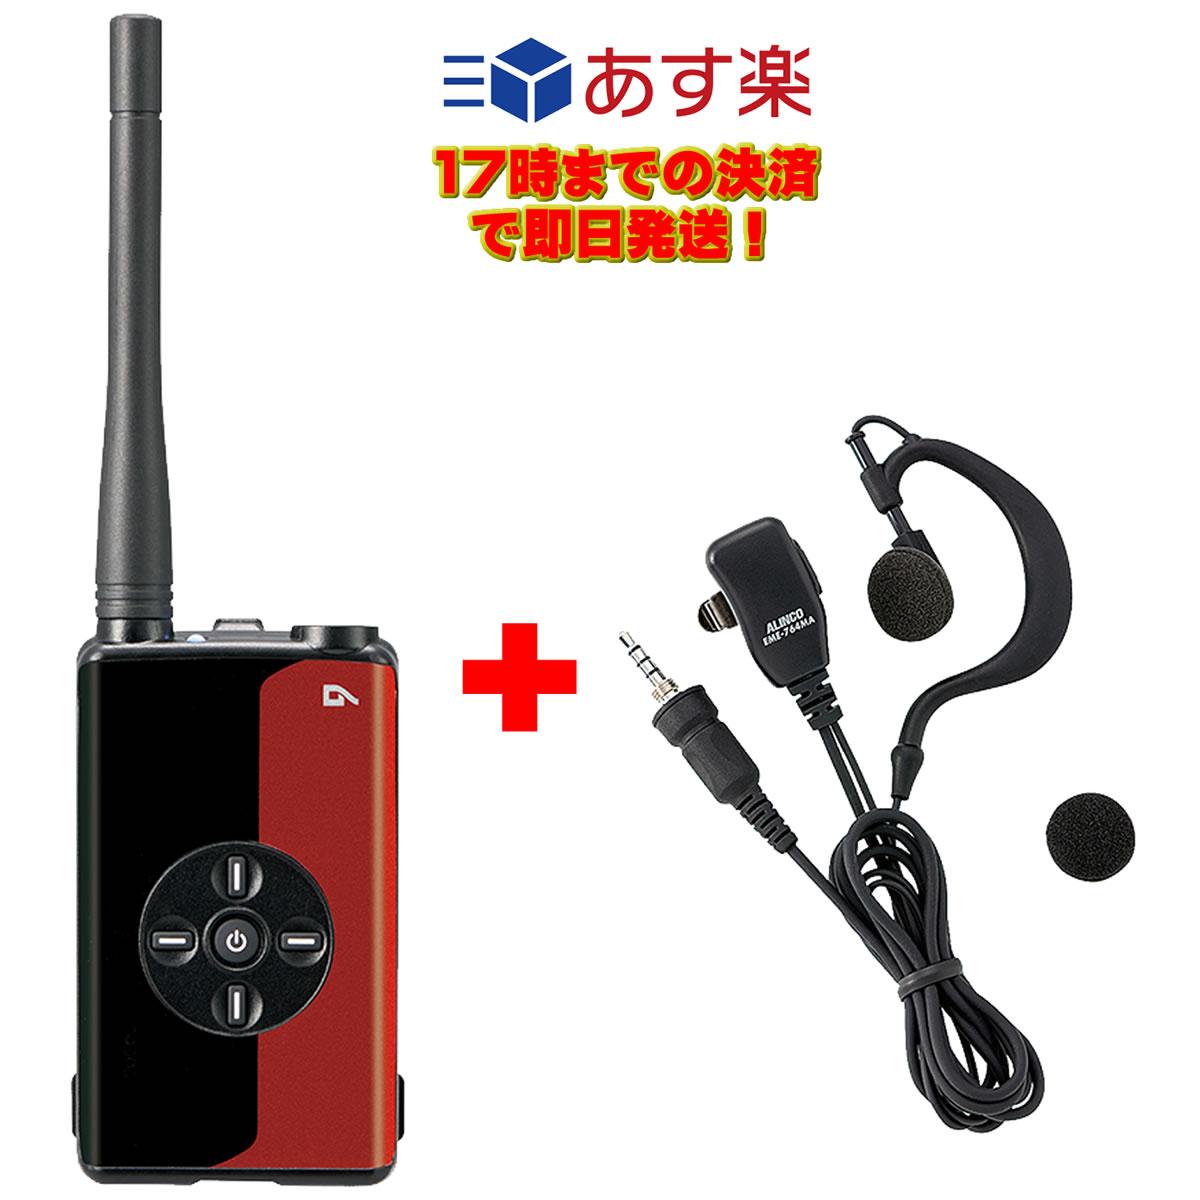 DJ-PX1RAとEME-764MAセット デジタル登録局 ハンディトランシーバー ルビーレッド 5W デジタル30ch (351MHz)